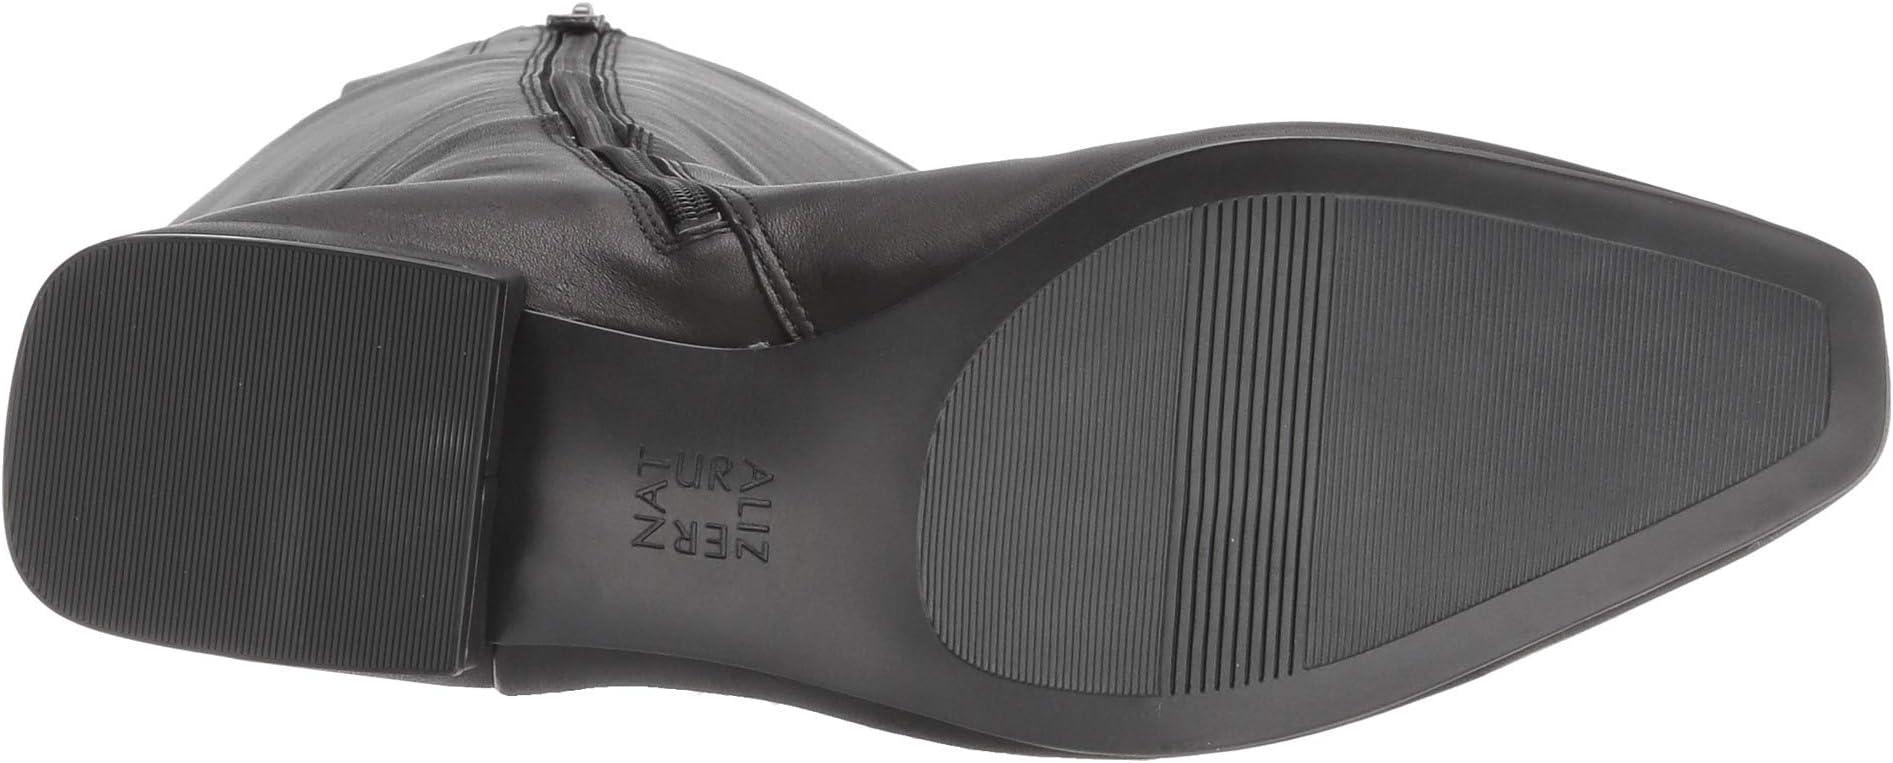 Naturalizer Carella Wide Shaft | Women's shoes | 2020 Newest